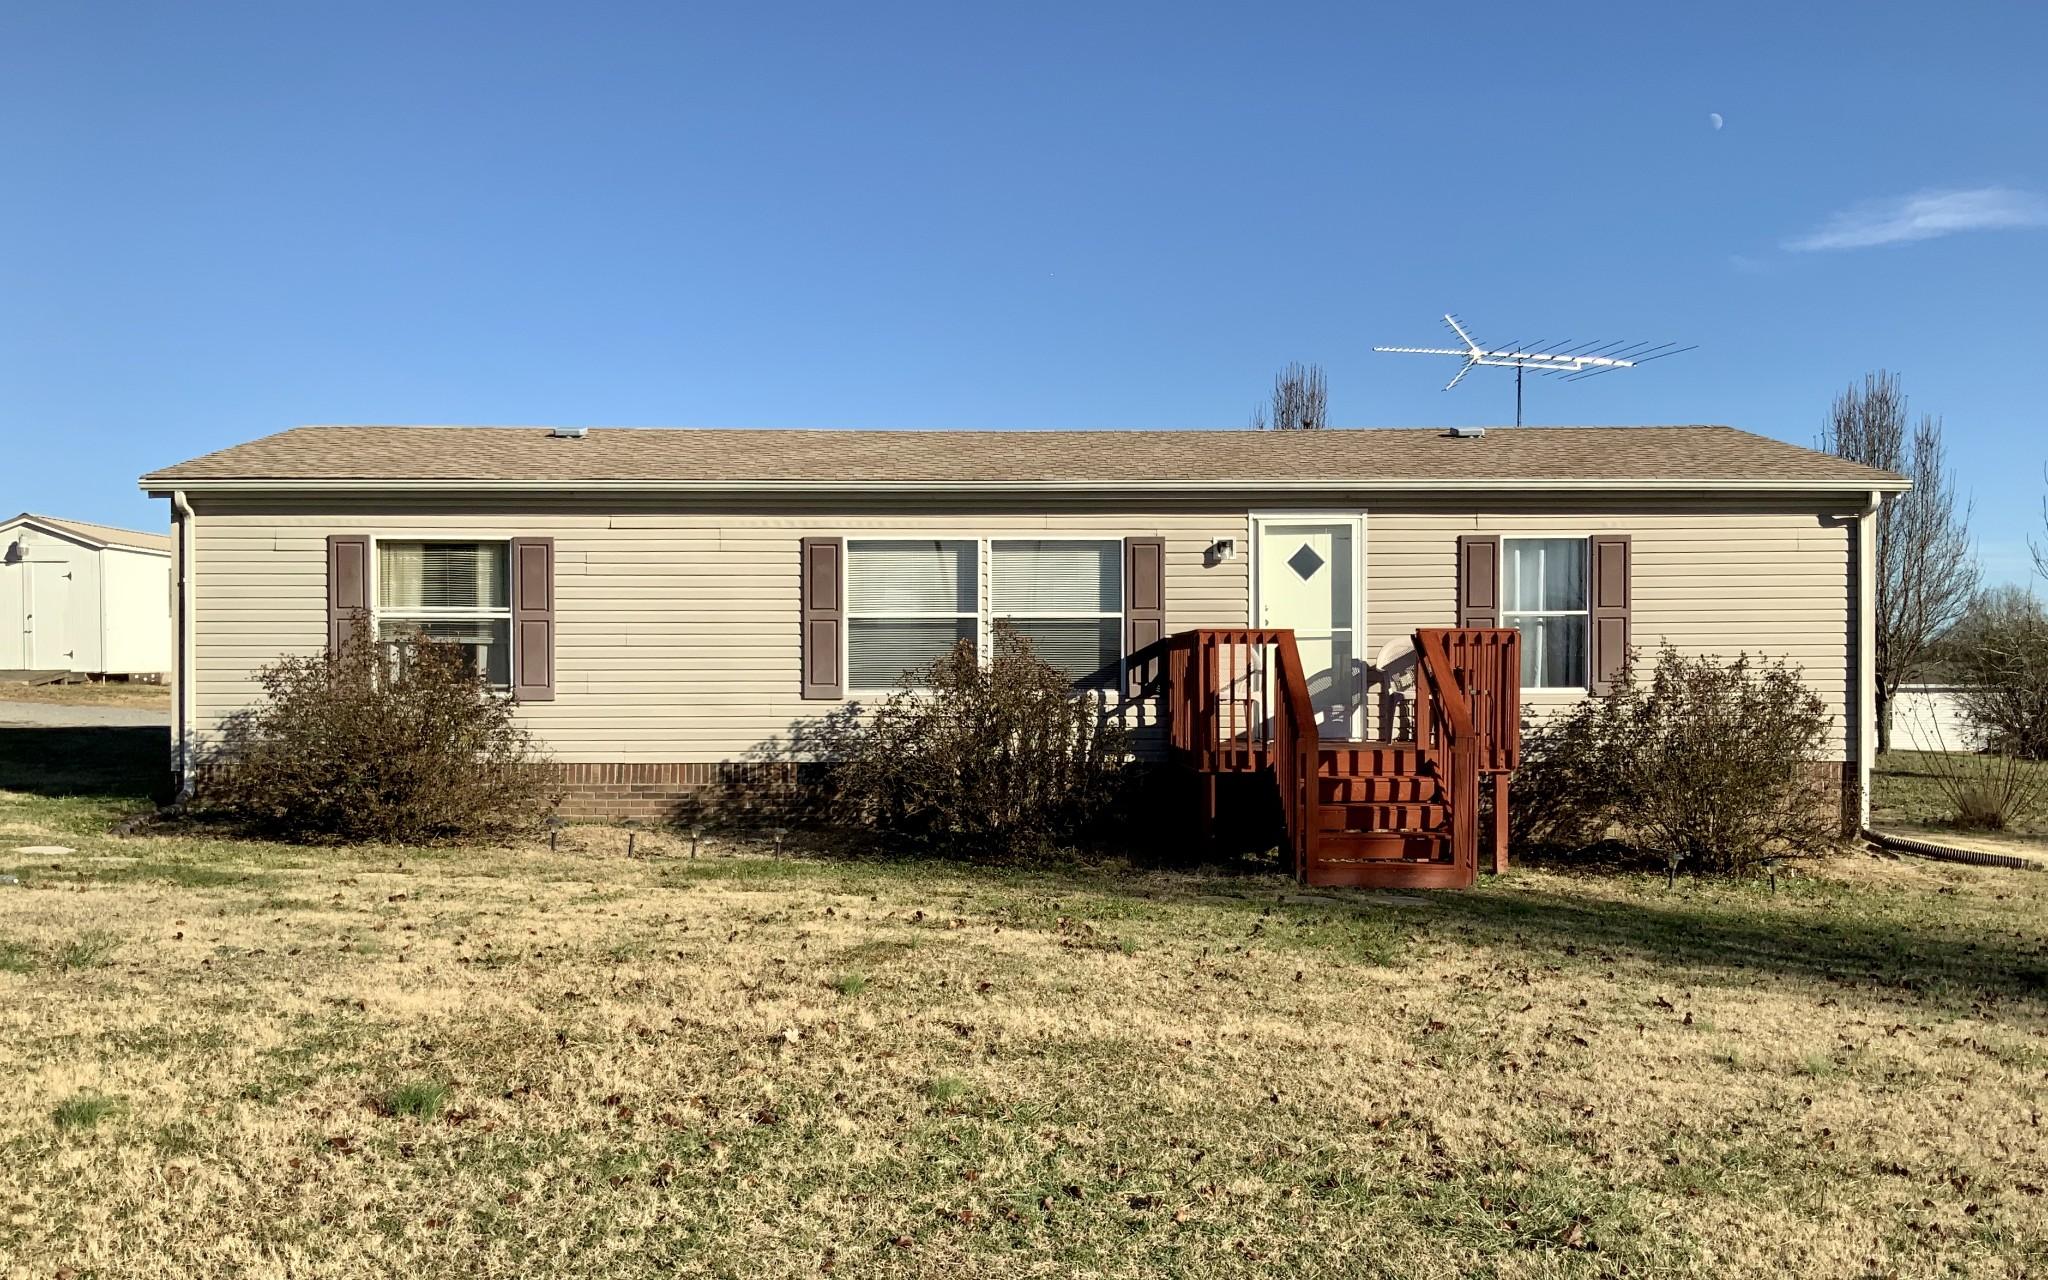 3639 Nashville Hwy, Lewisburg, TN 37091 - Lewisburg, TN real estate listing